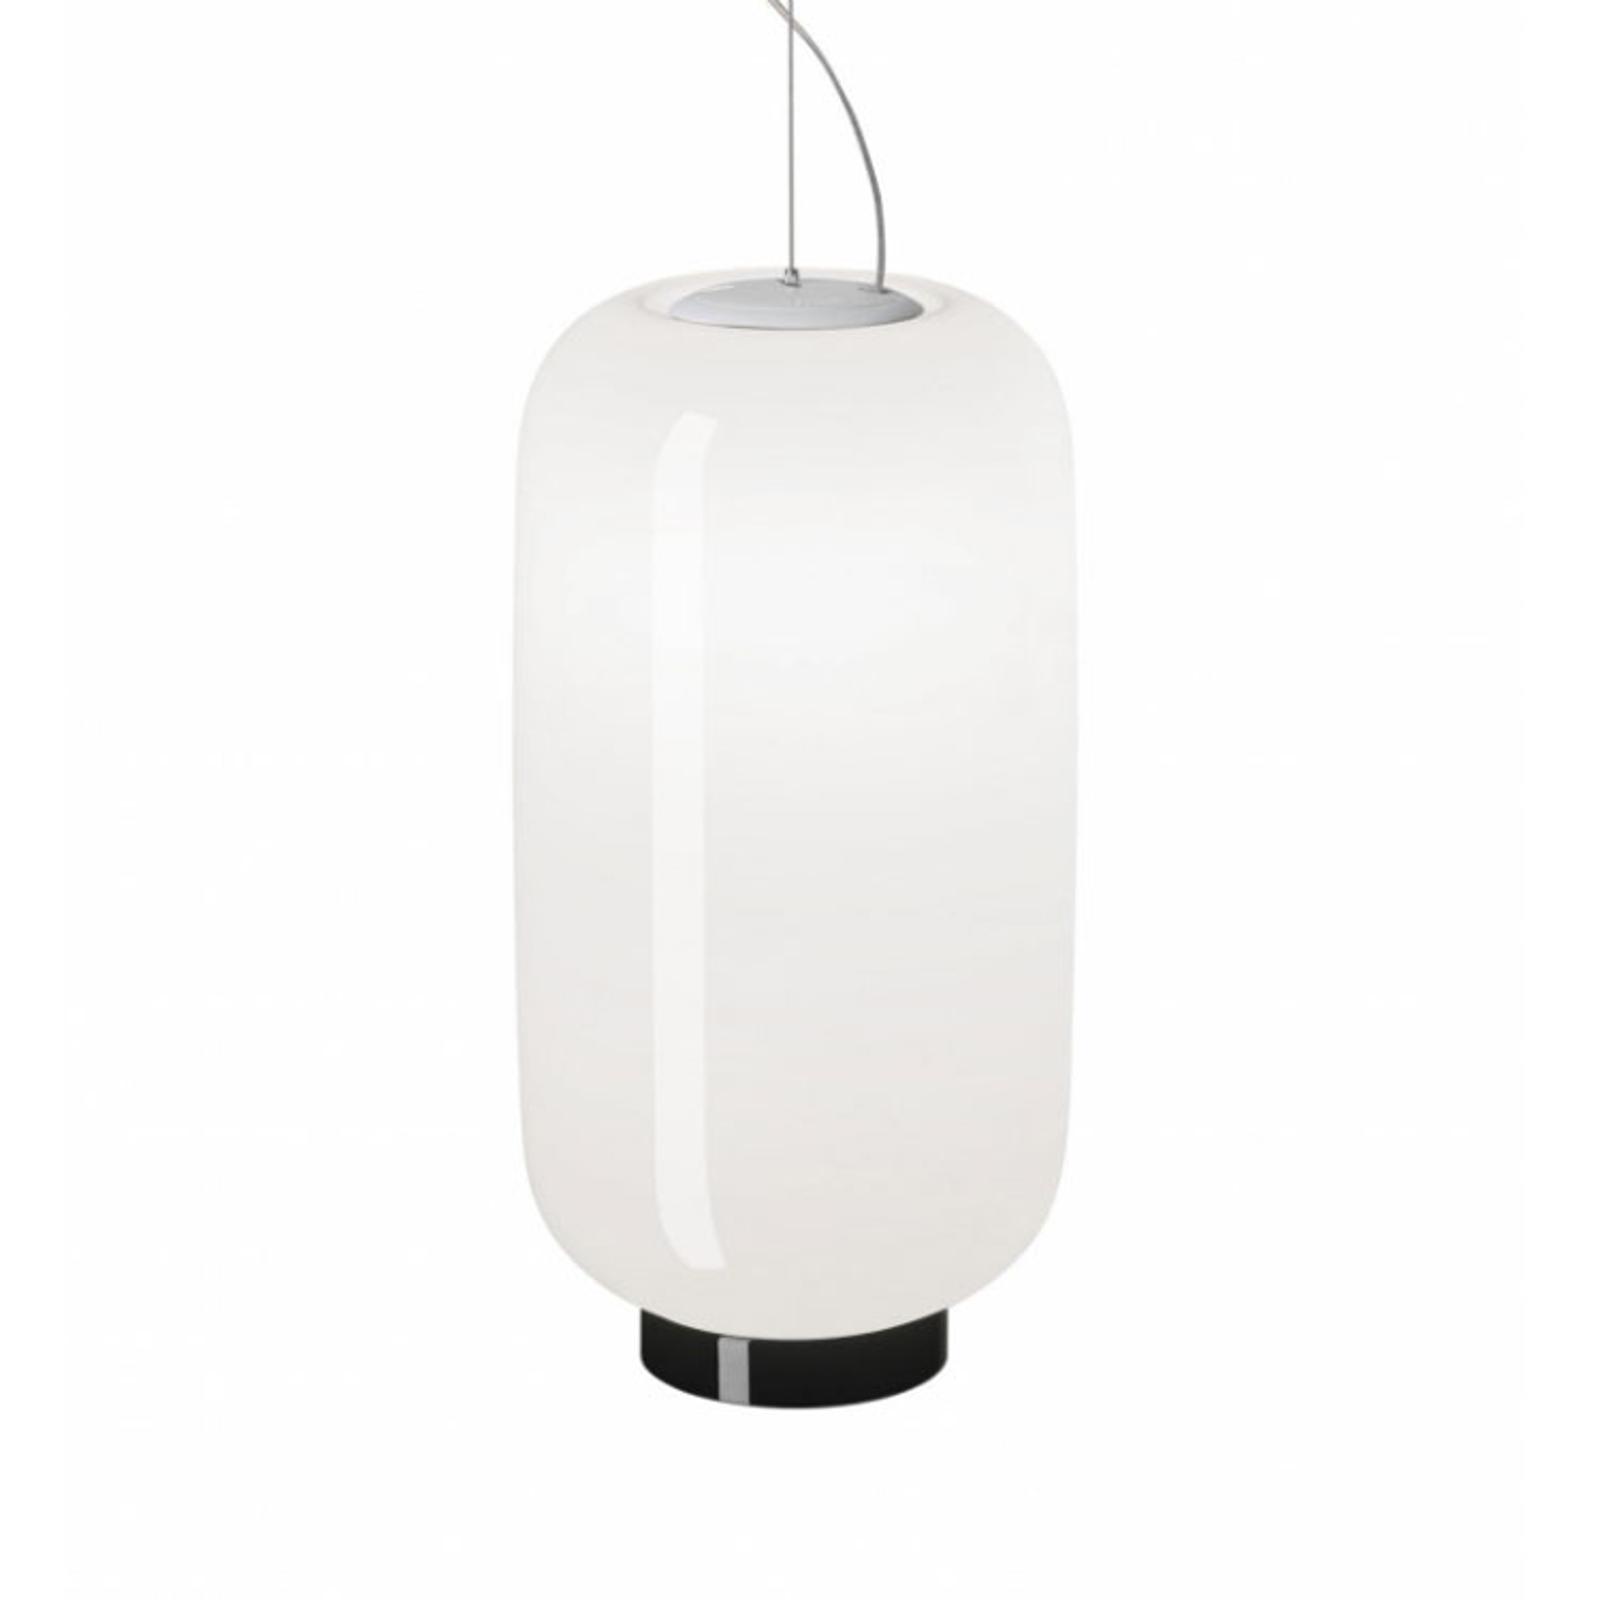 Foscarini Chouchin Reverse 2 LED black/weiß on/off